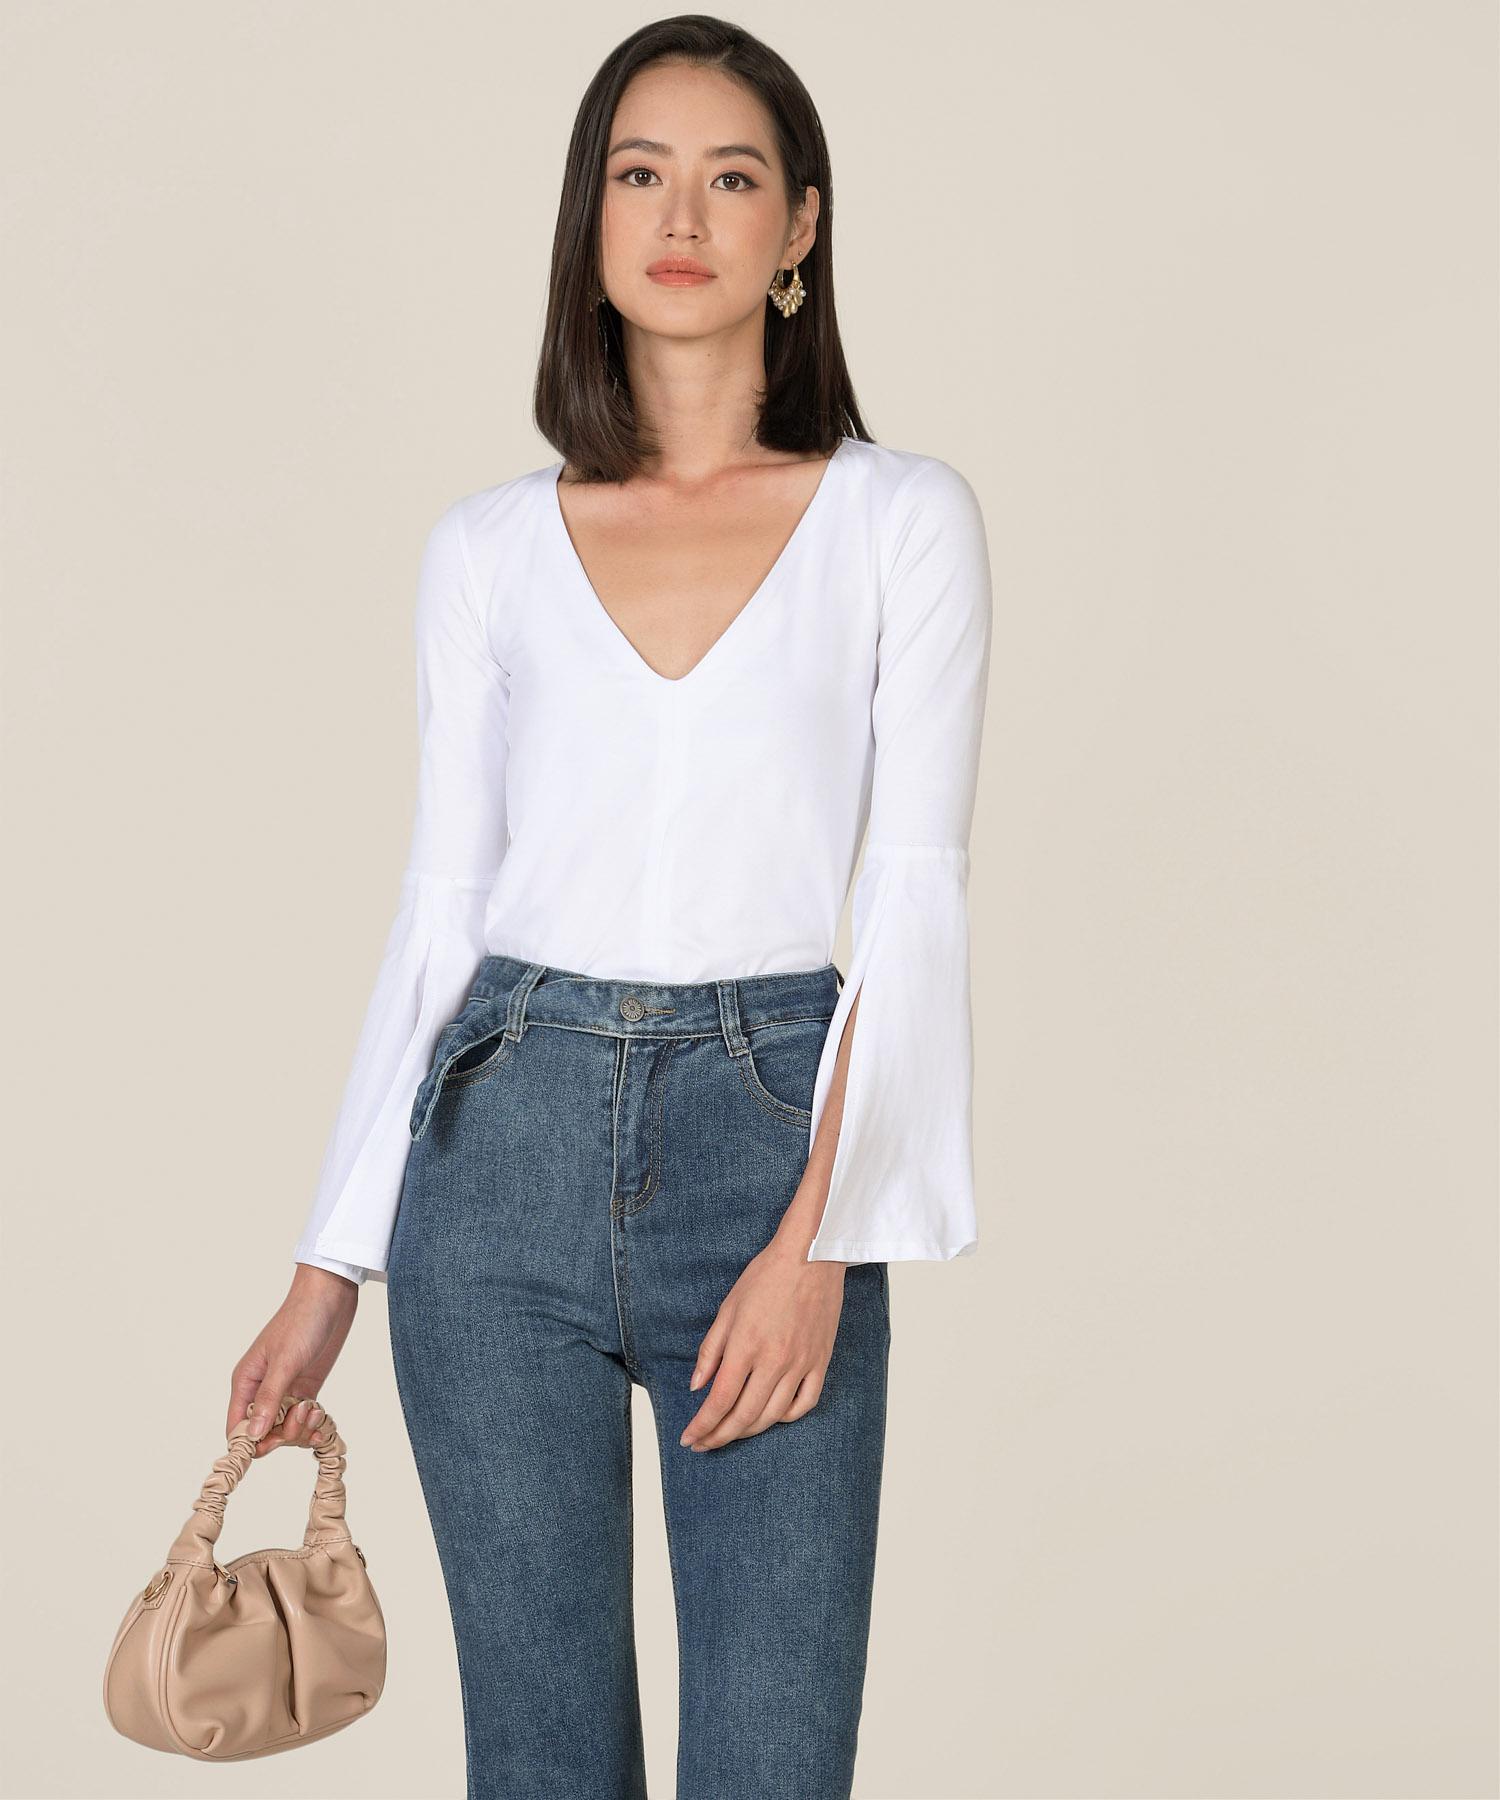 valence-trumpet-sleeve-blouse-white-1